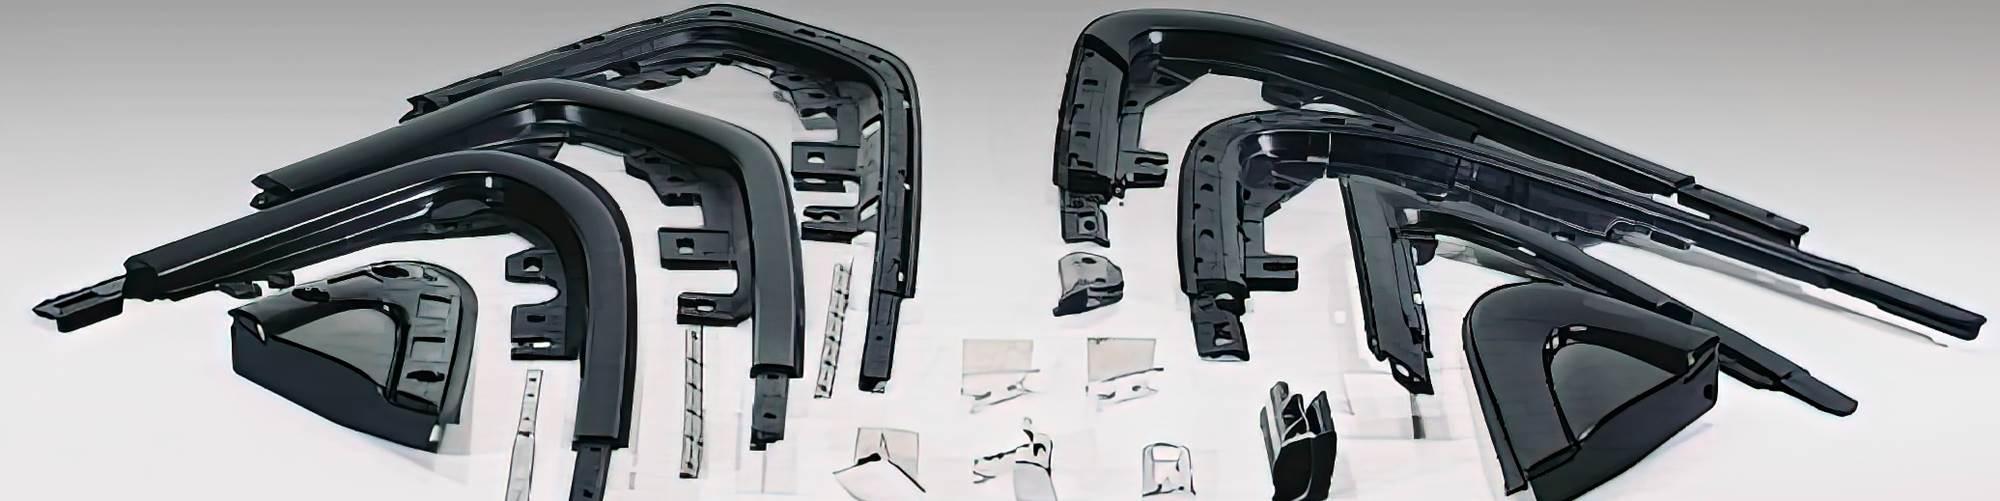 Two-shot overmolded automotive trim parts